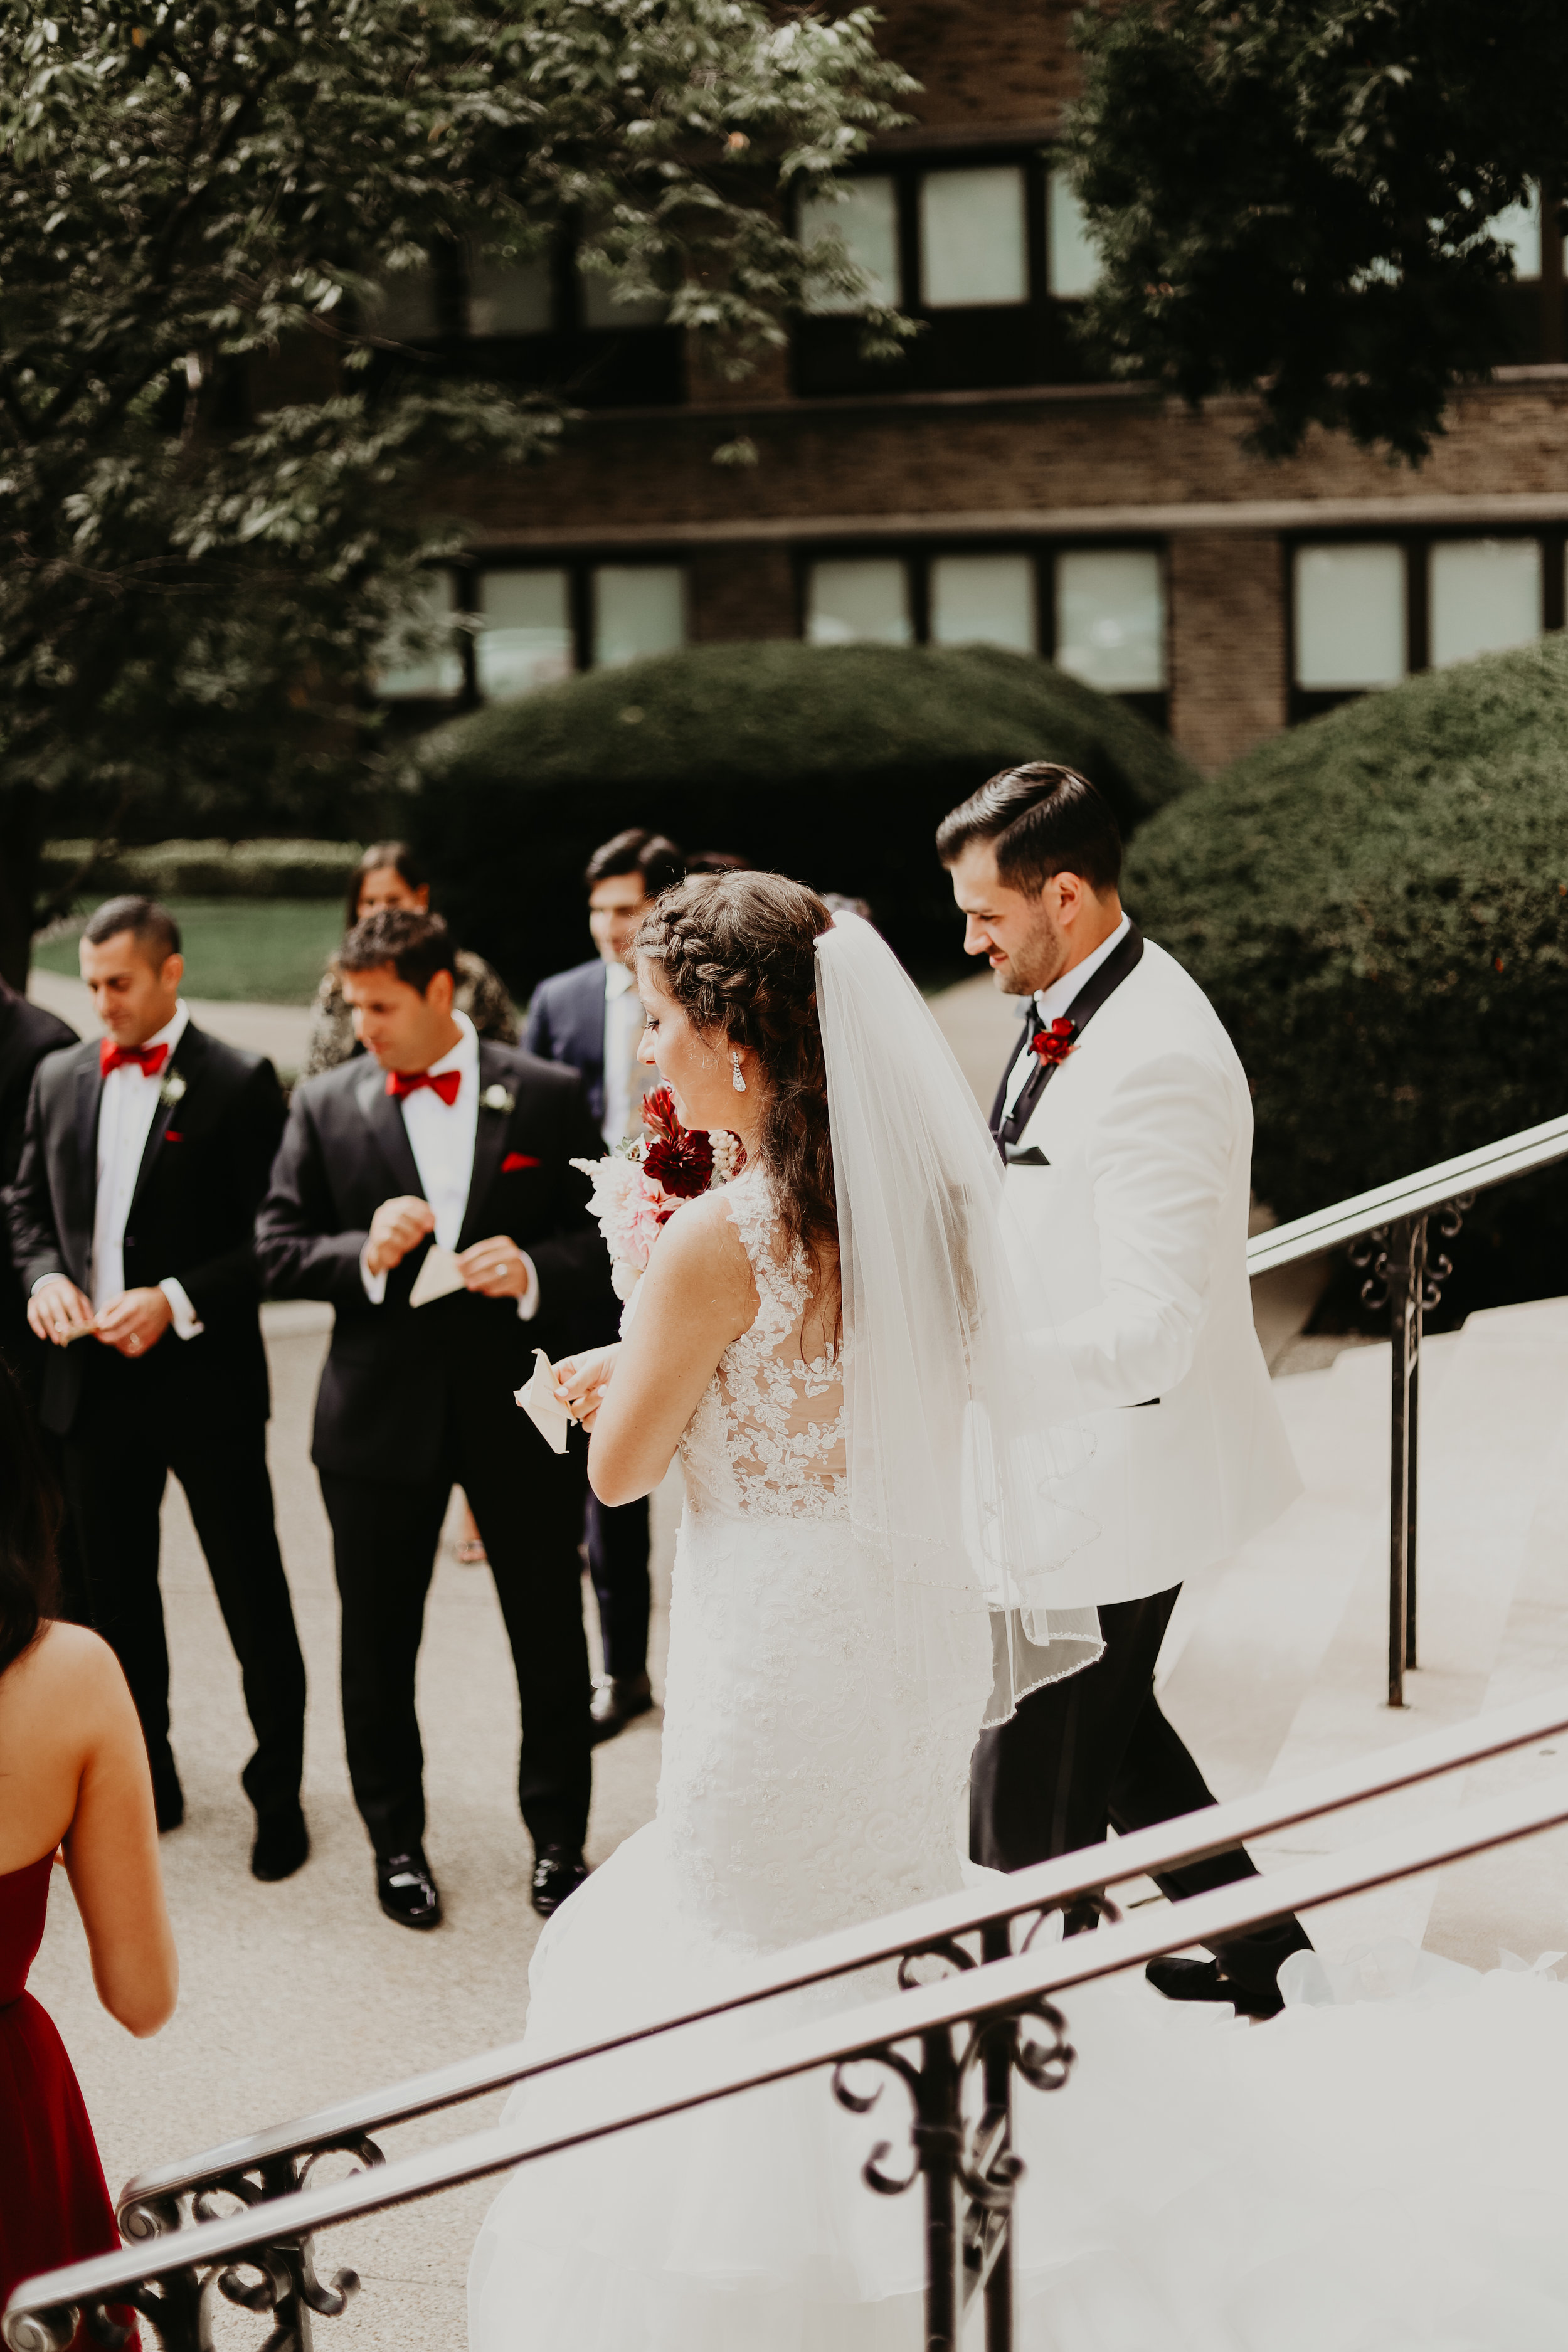 Gina + Ronnie Wedding 64 (1 of 1).jpg